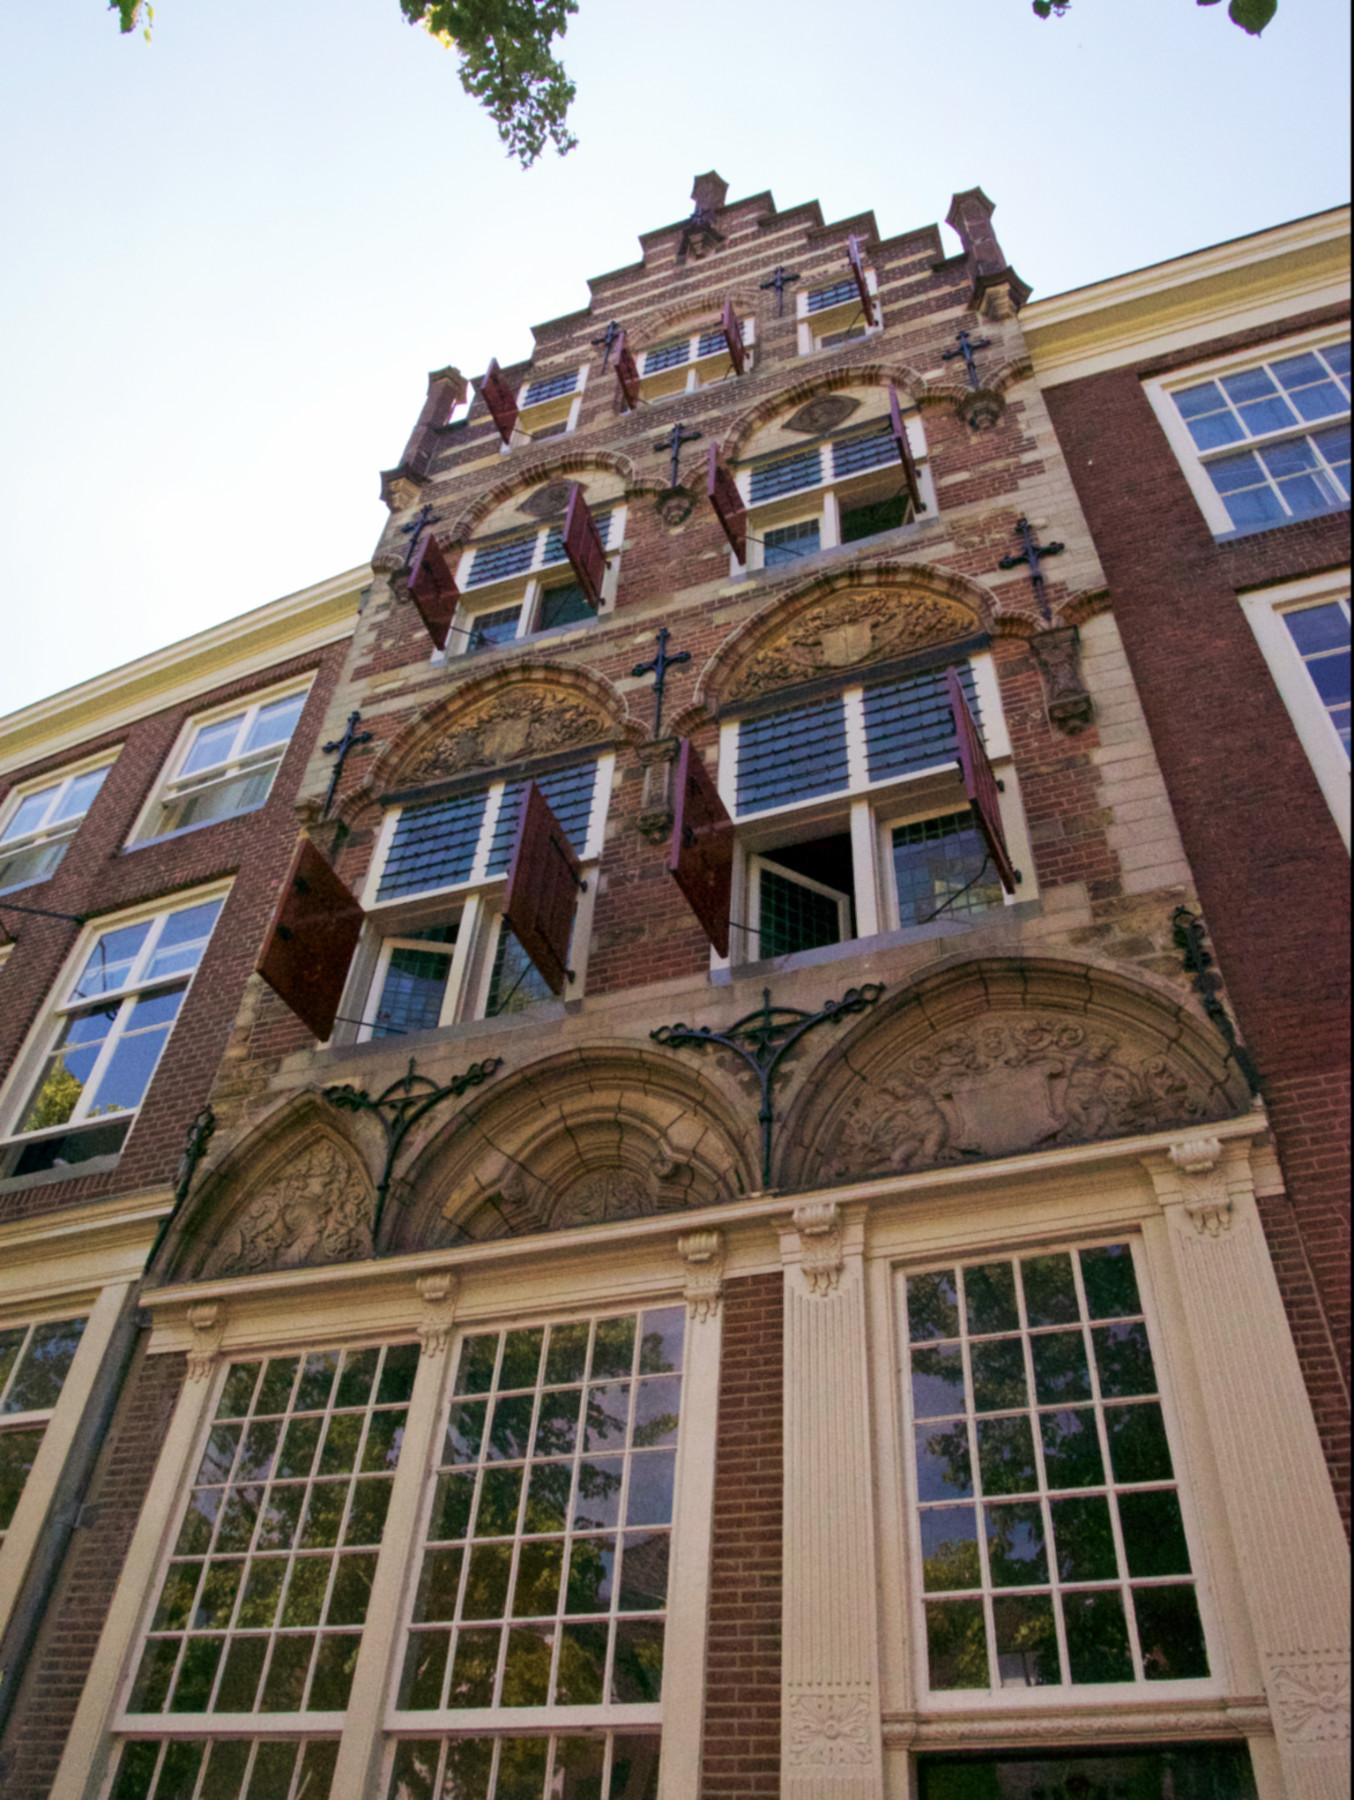 067-Nederland-Delft